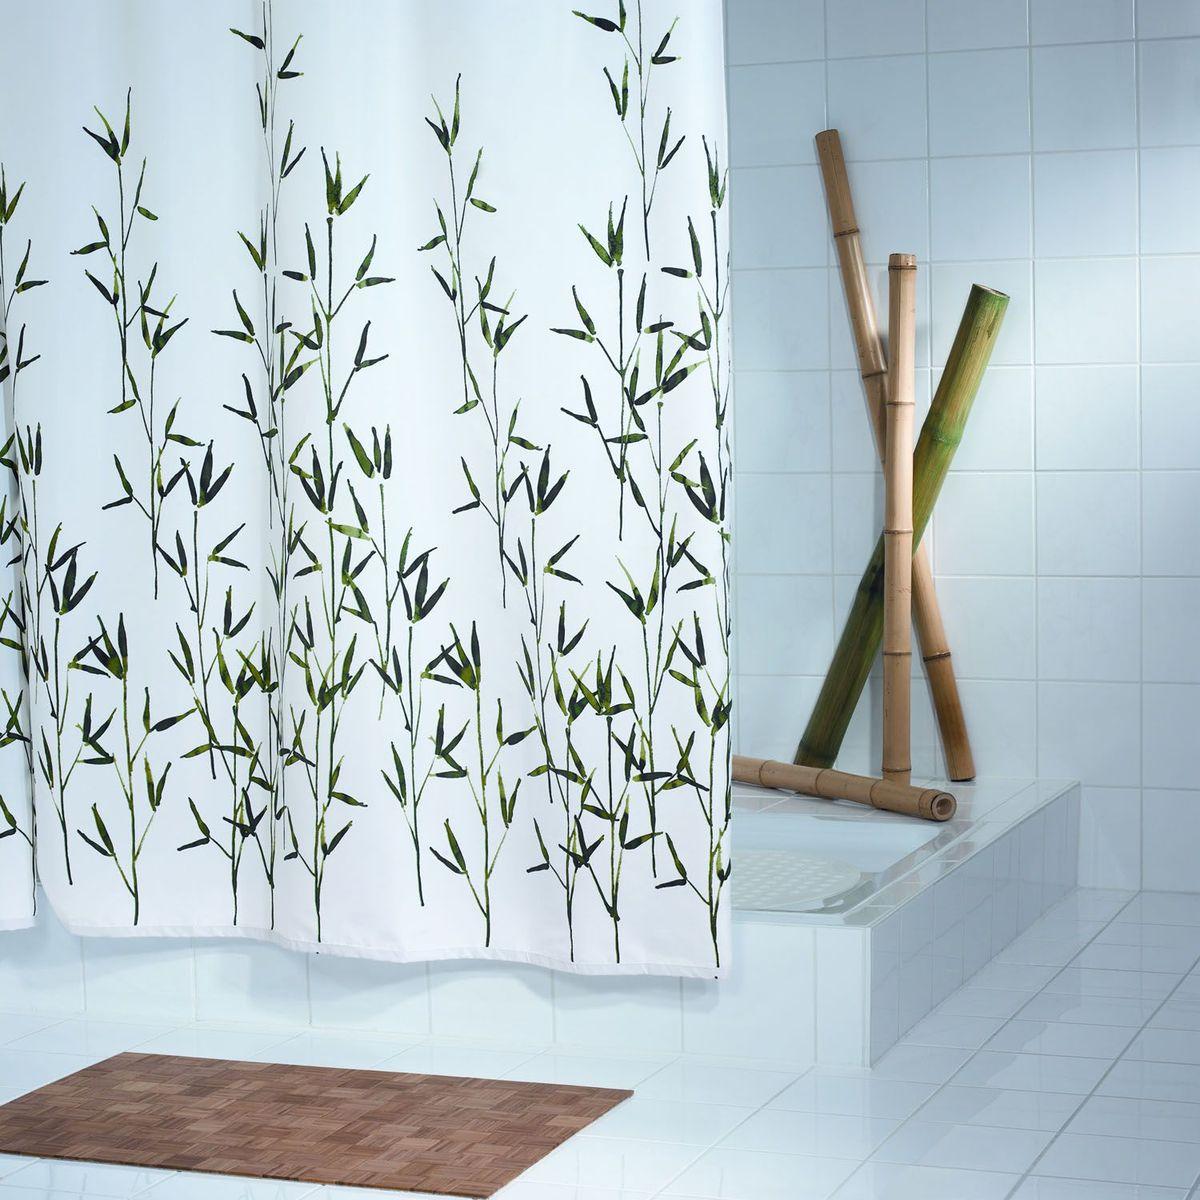 Штора для ванной комнаты Ridder Bambus, цвет: зеленый, 180 х 200 см штора для ванной комнаты ridder helgoland цвет синий голубой 240 х 180 см